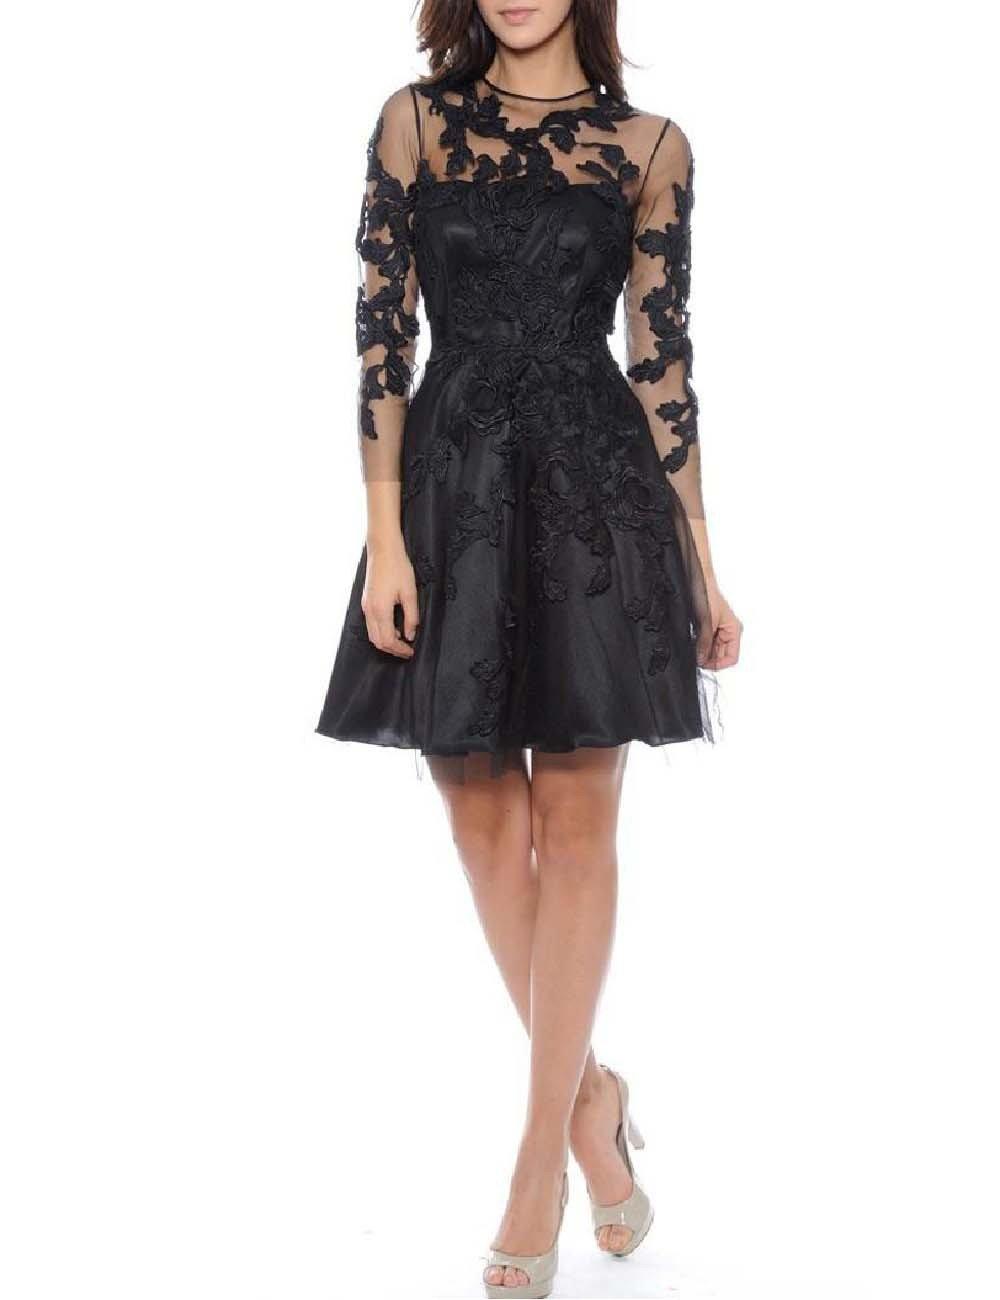 Udresses Women's Long Sleeve Lace Cocktail Short Formal Evening Party Dress FX30 Black 16